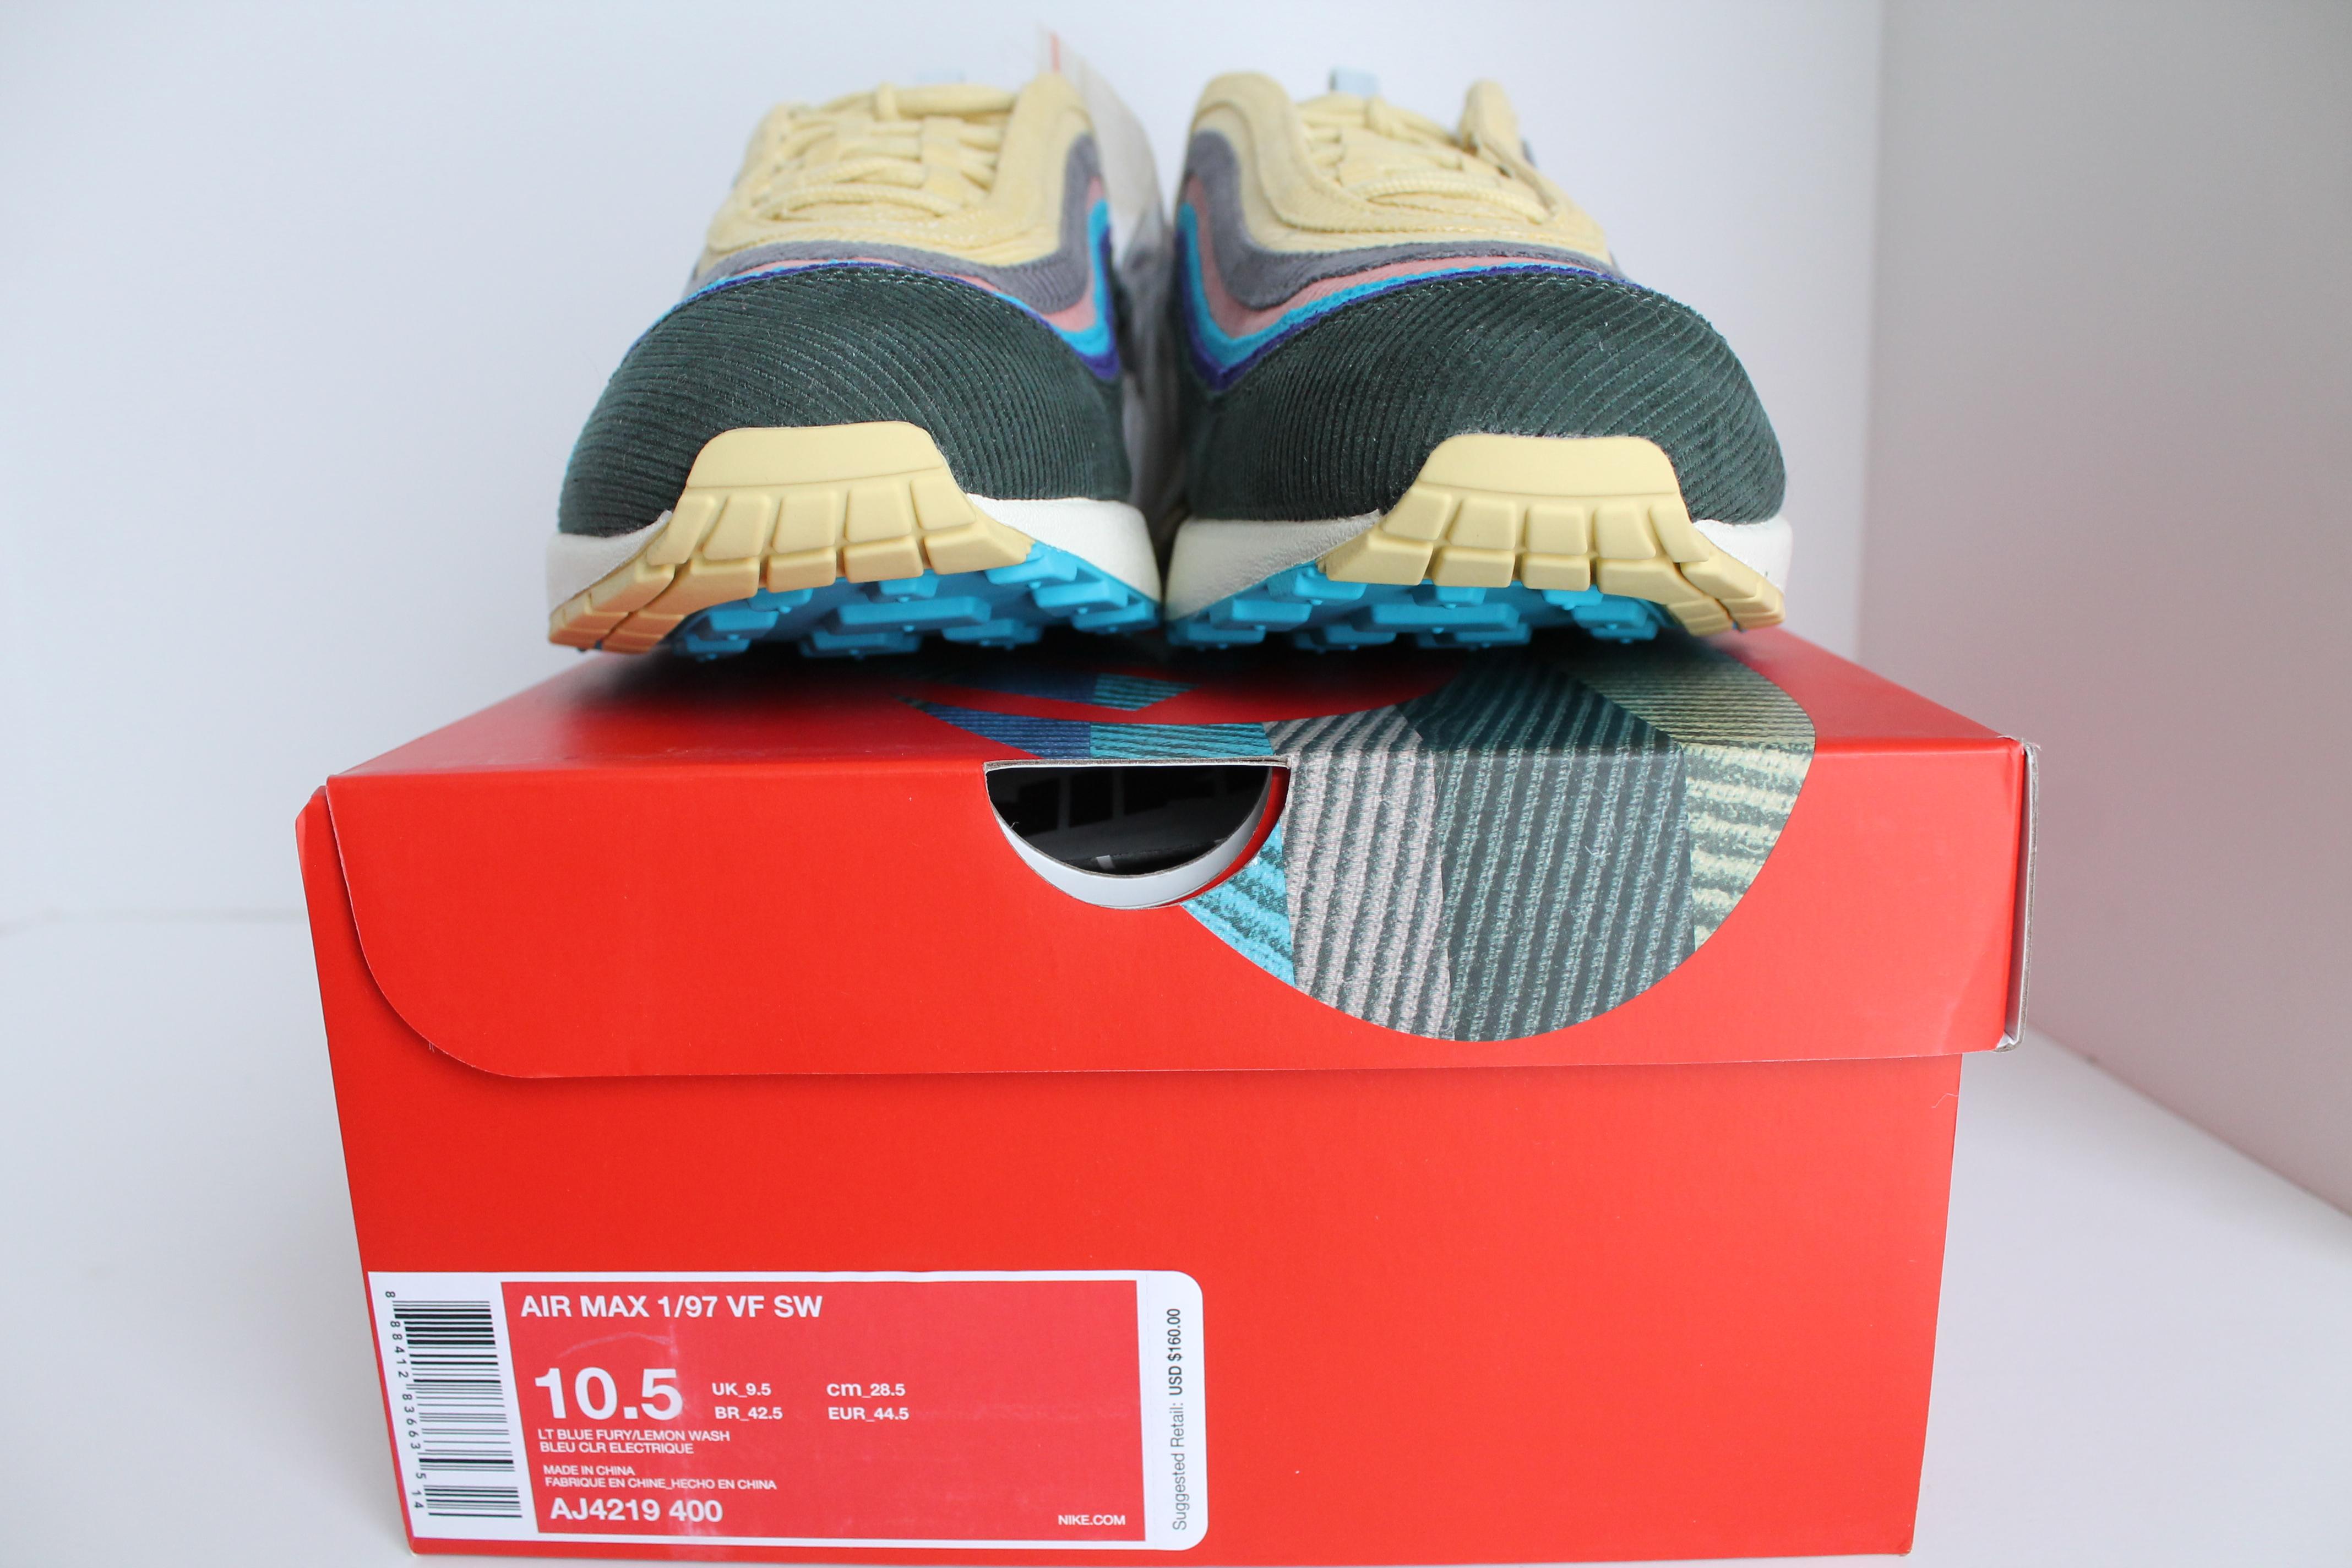 buy popular 7cc48 314cb ... Nike Air Max 1 97 VF Sean Wotherspoon ...